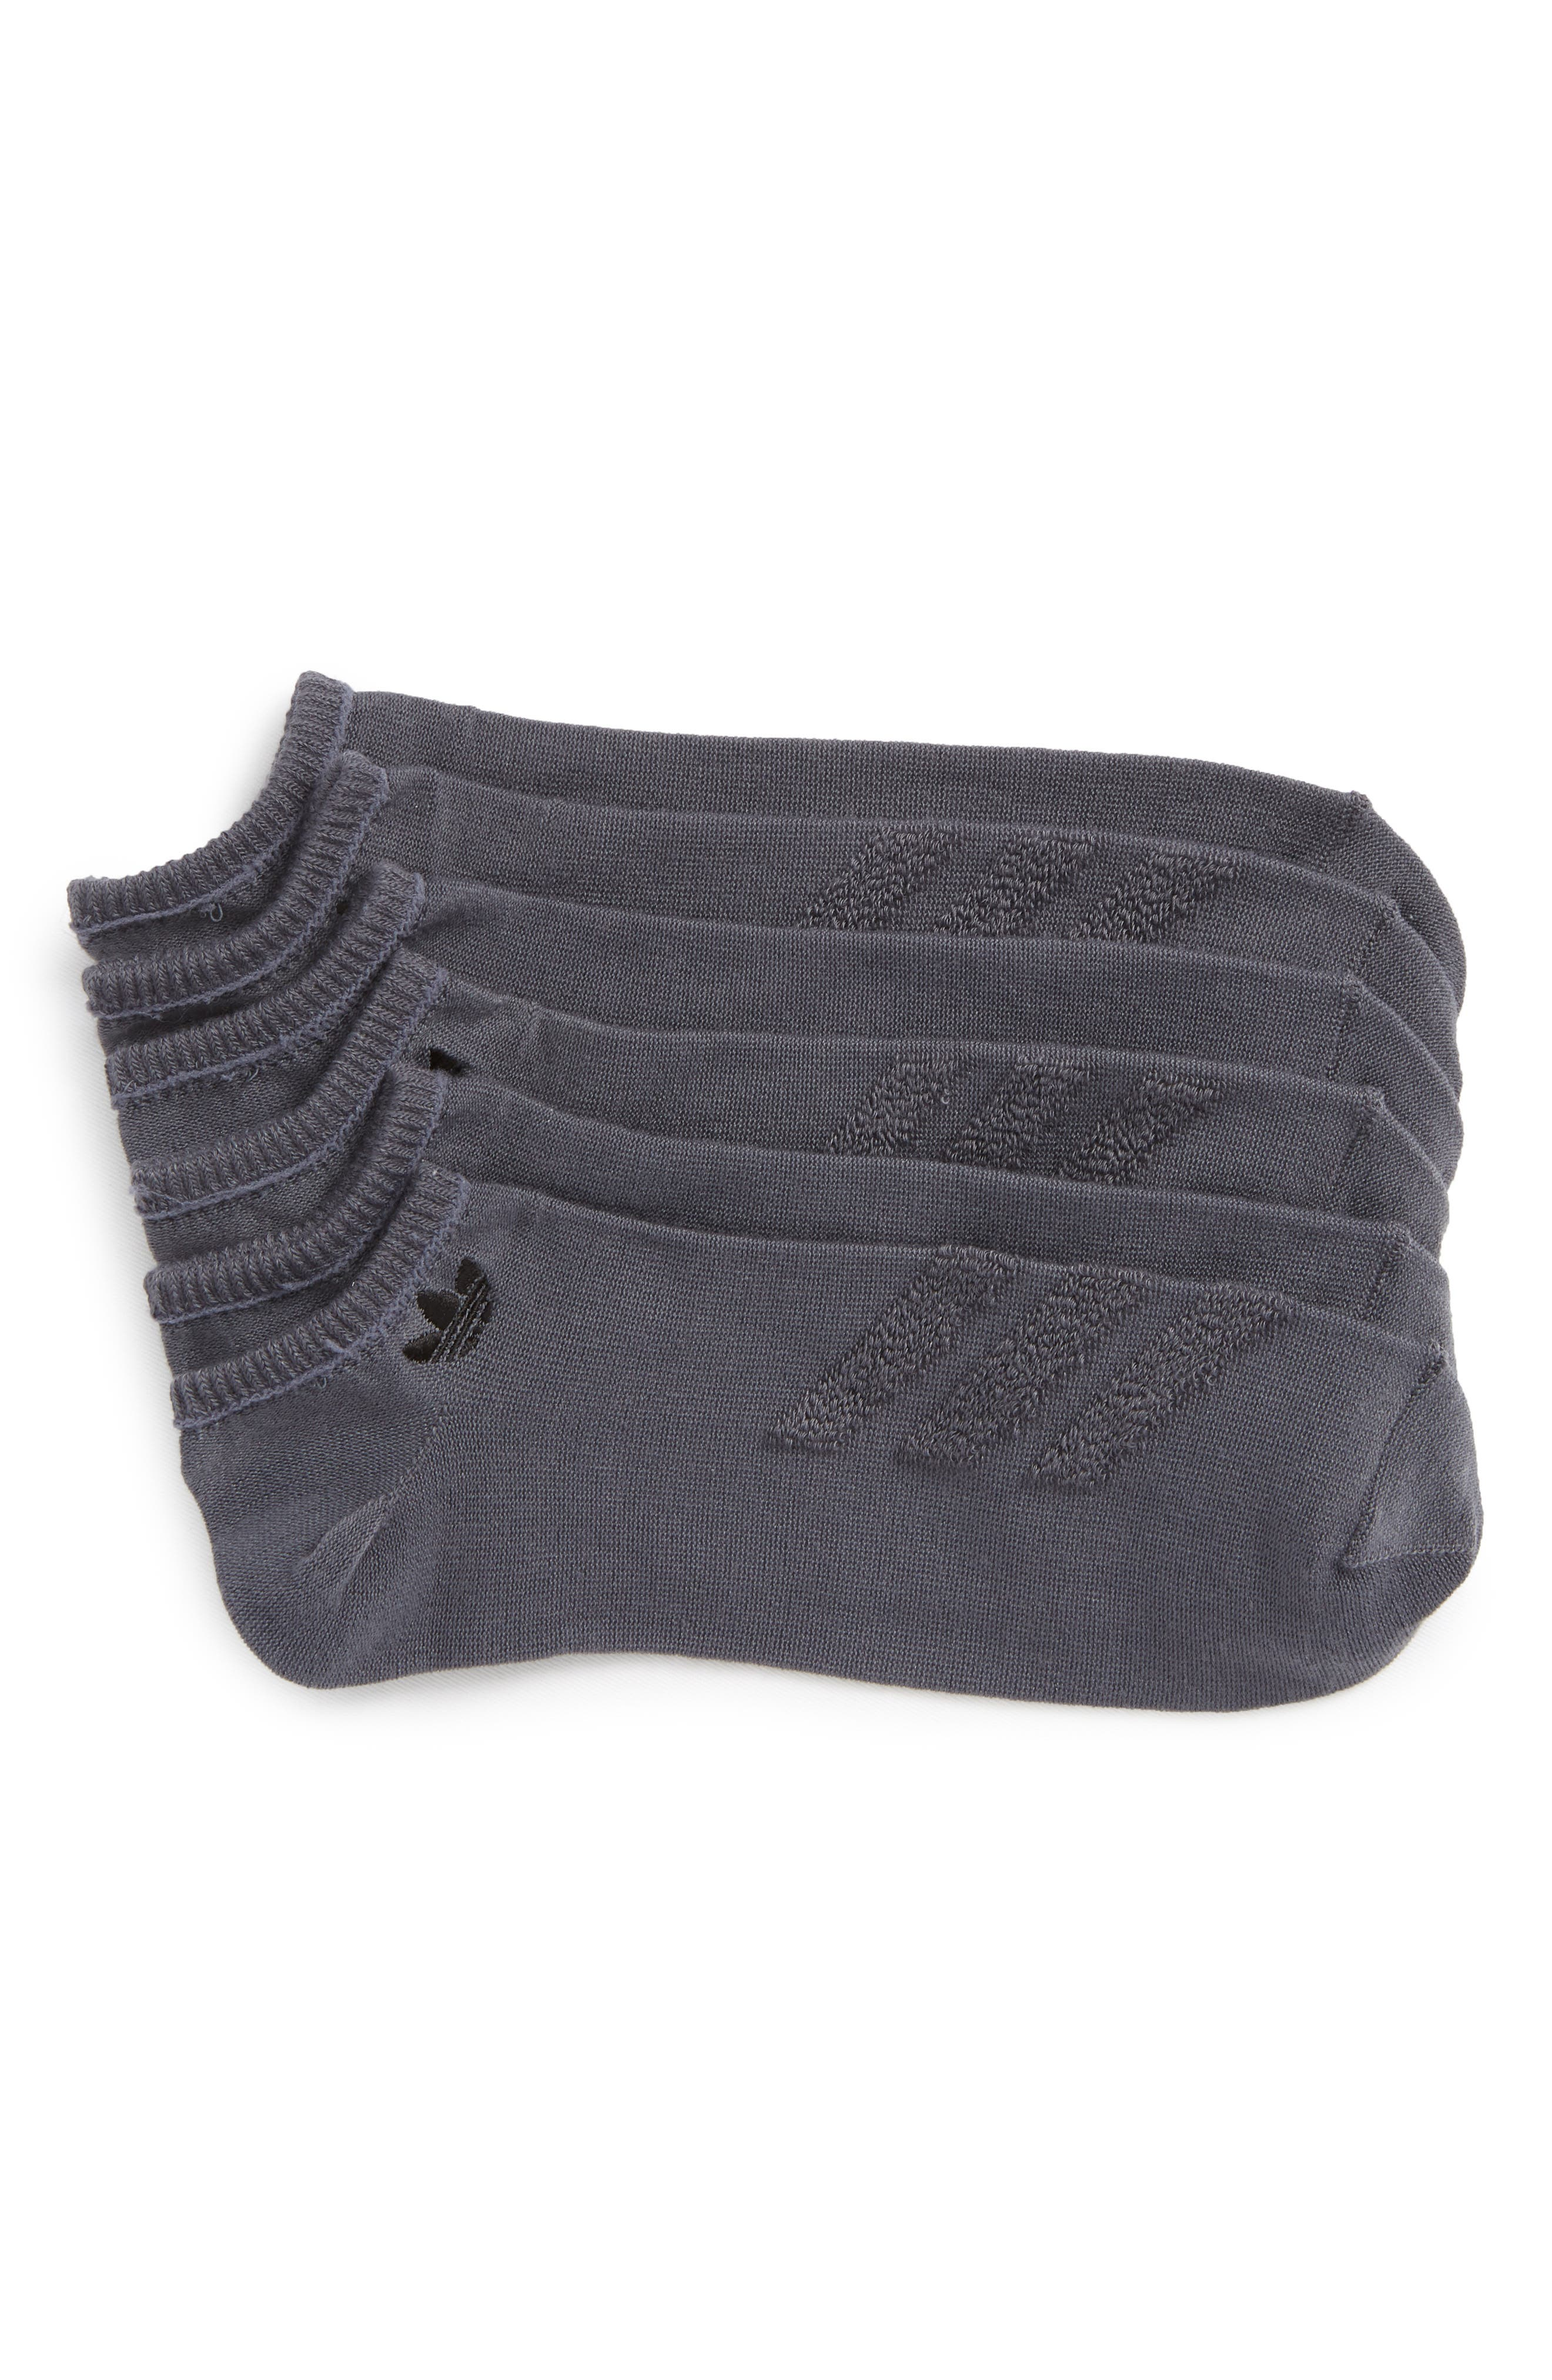 3-Pack Ankle Socks,                         Main,                         color, Dark Grey